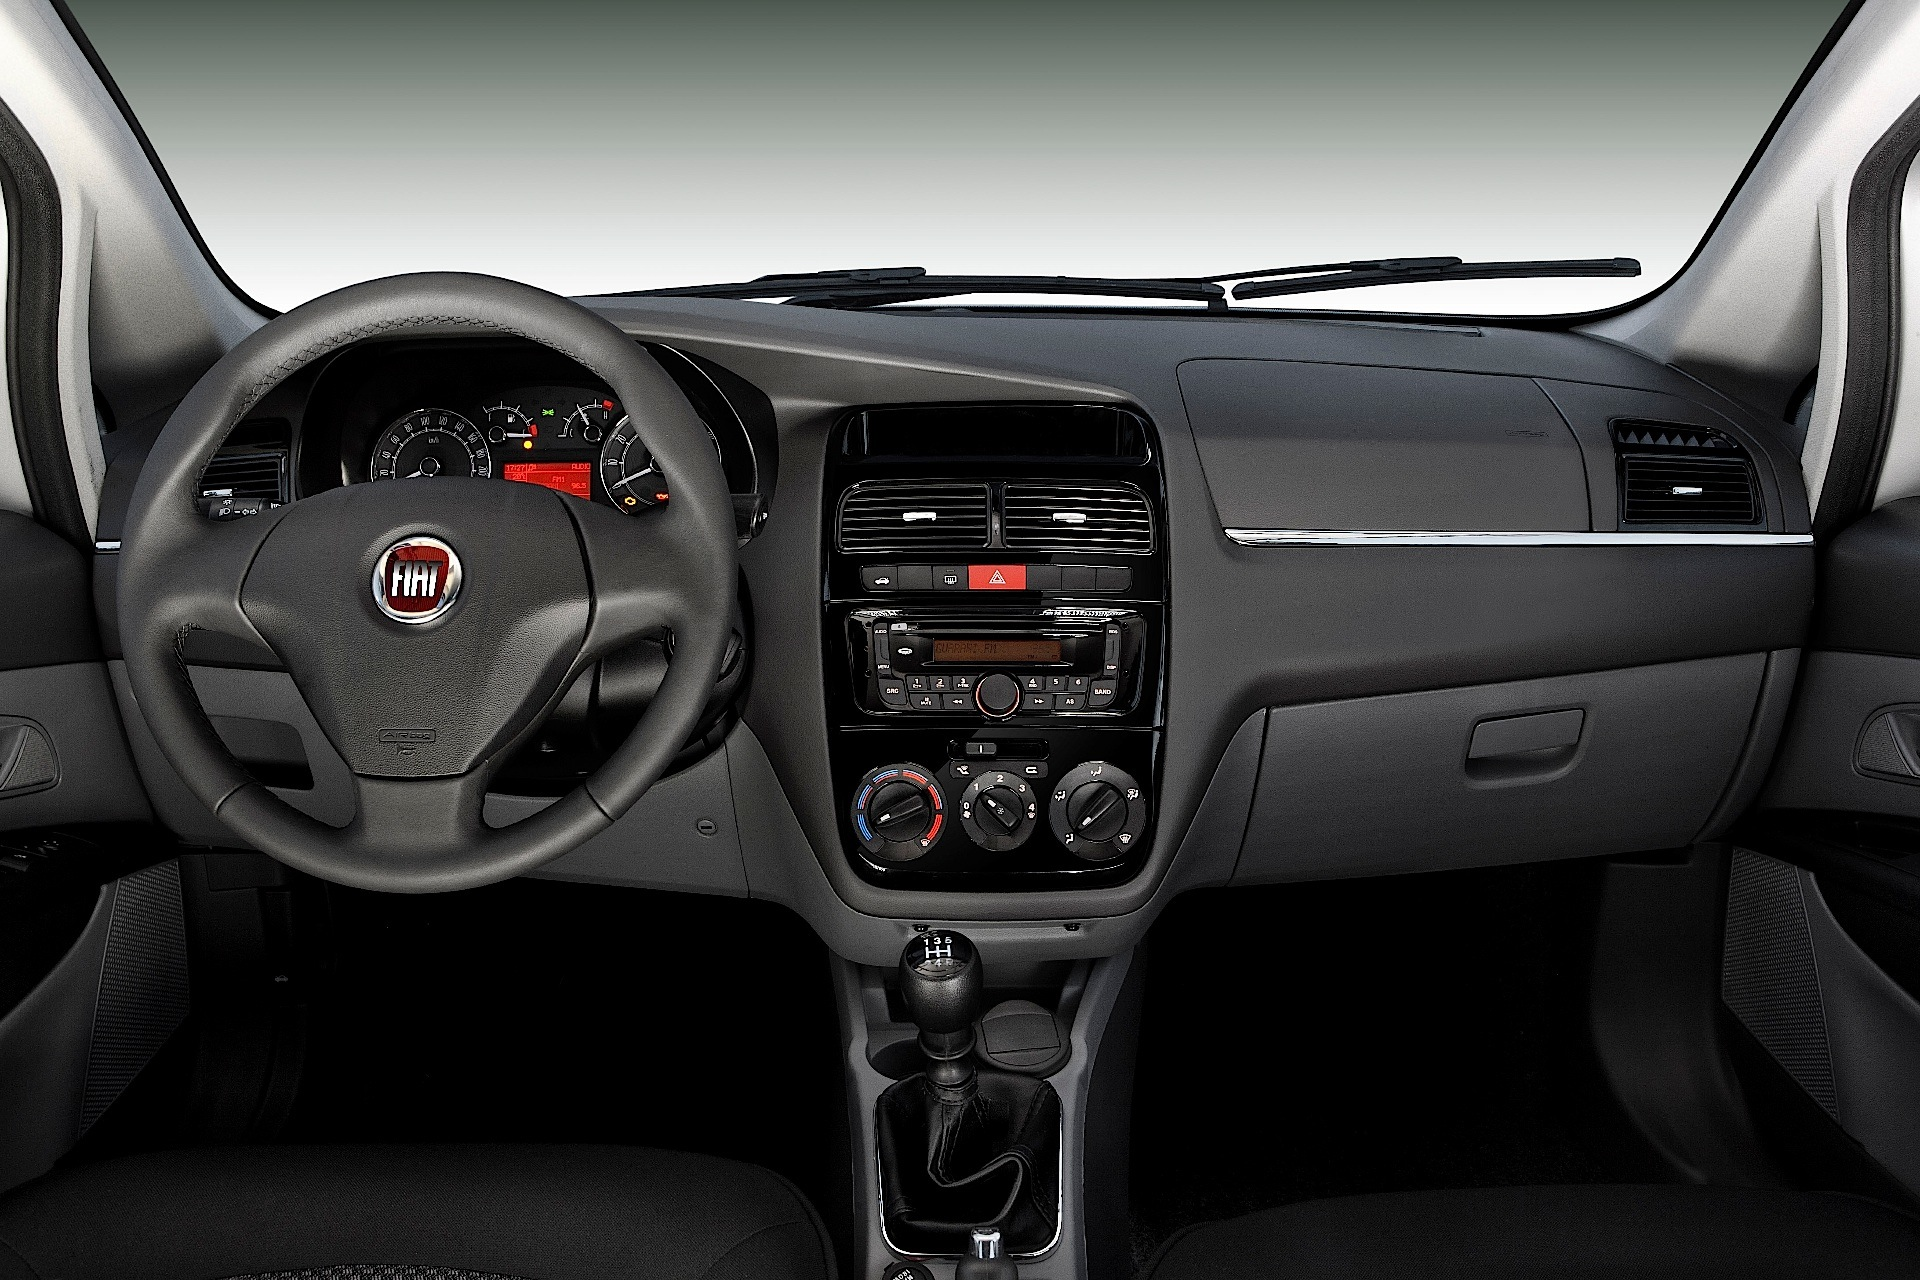 interior grand new veloz 1.3 oli mesin untuk avanza fiat linea specs and photos 2006 2007 2008 2009 2010